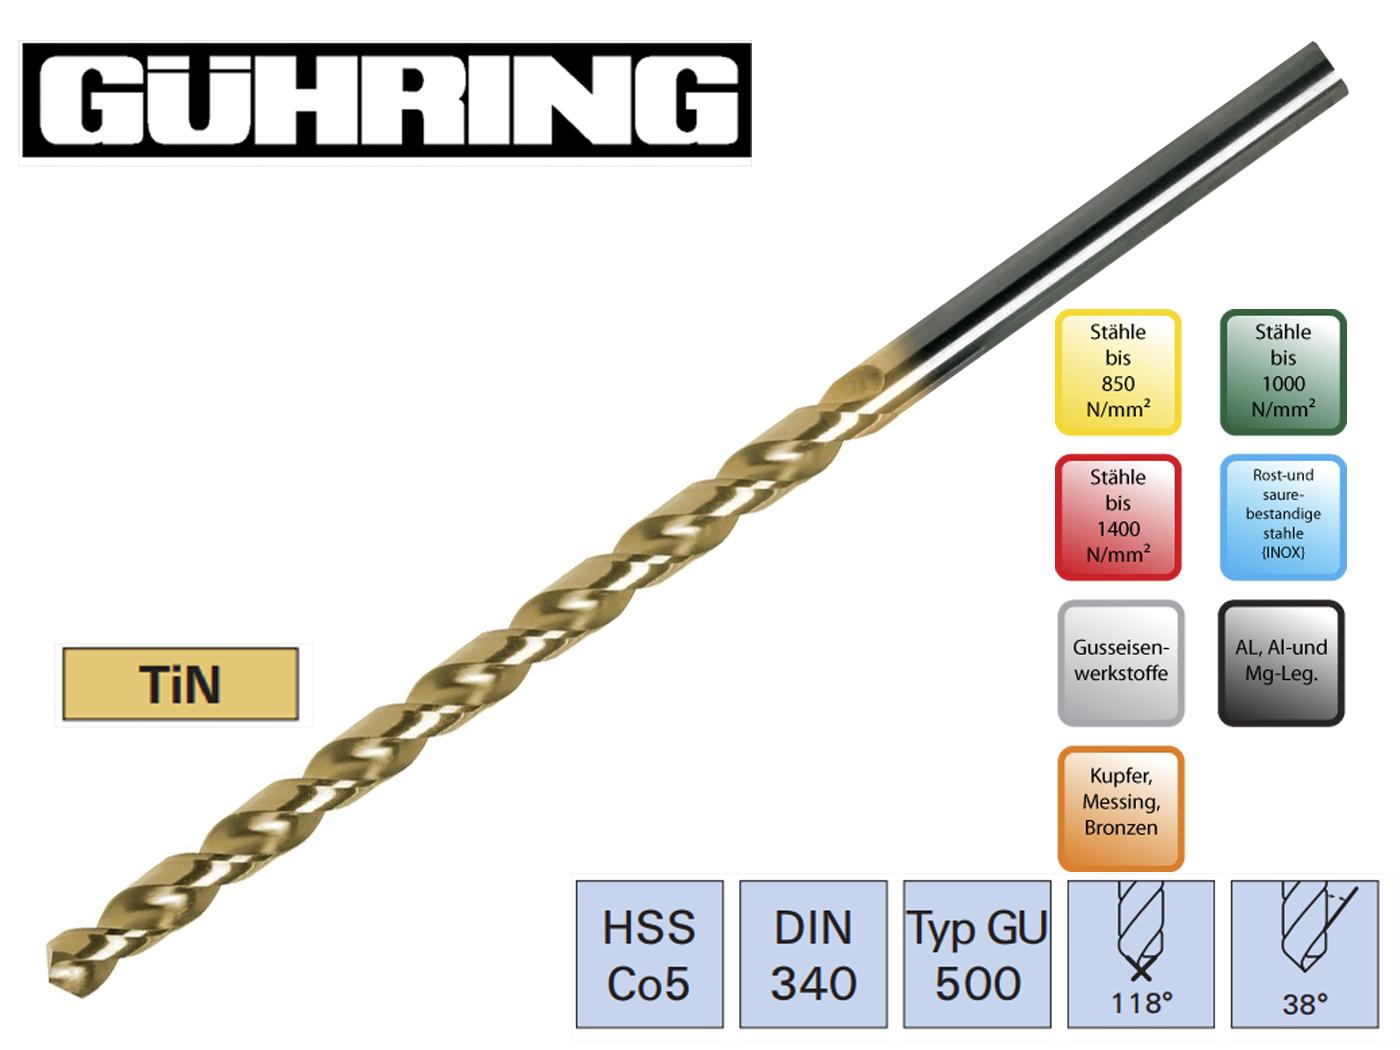 Spiraalboor DIN 340 GU HSSE Co5 TiN Format | DKMTools - DKM Tools